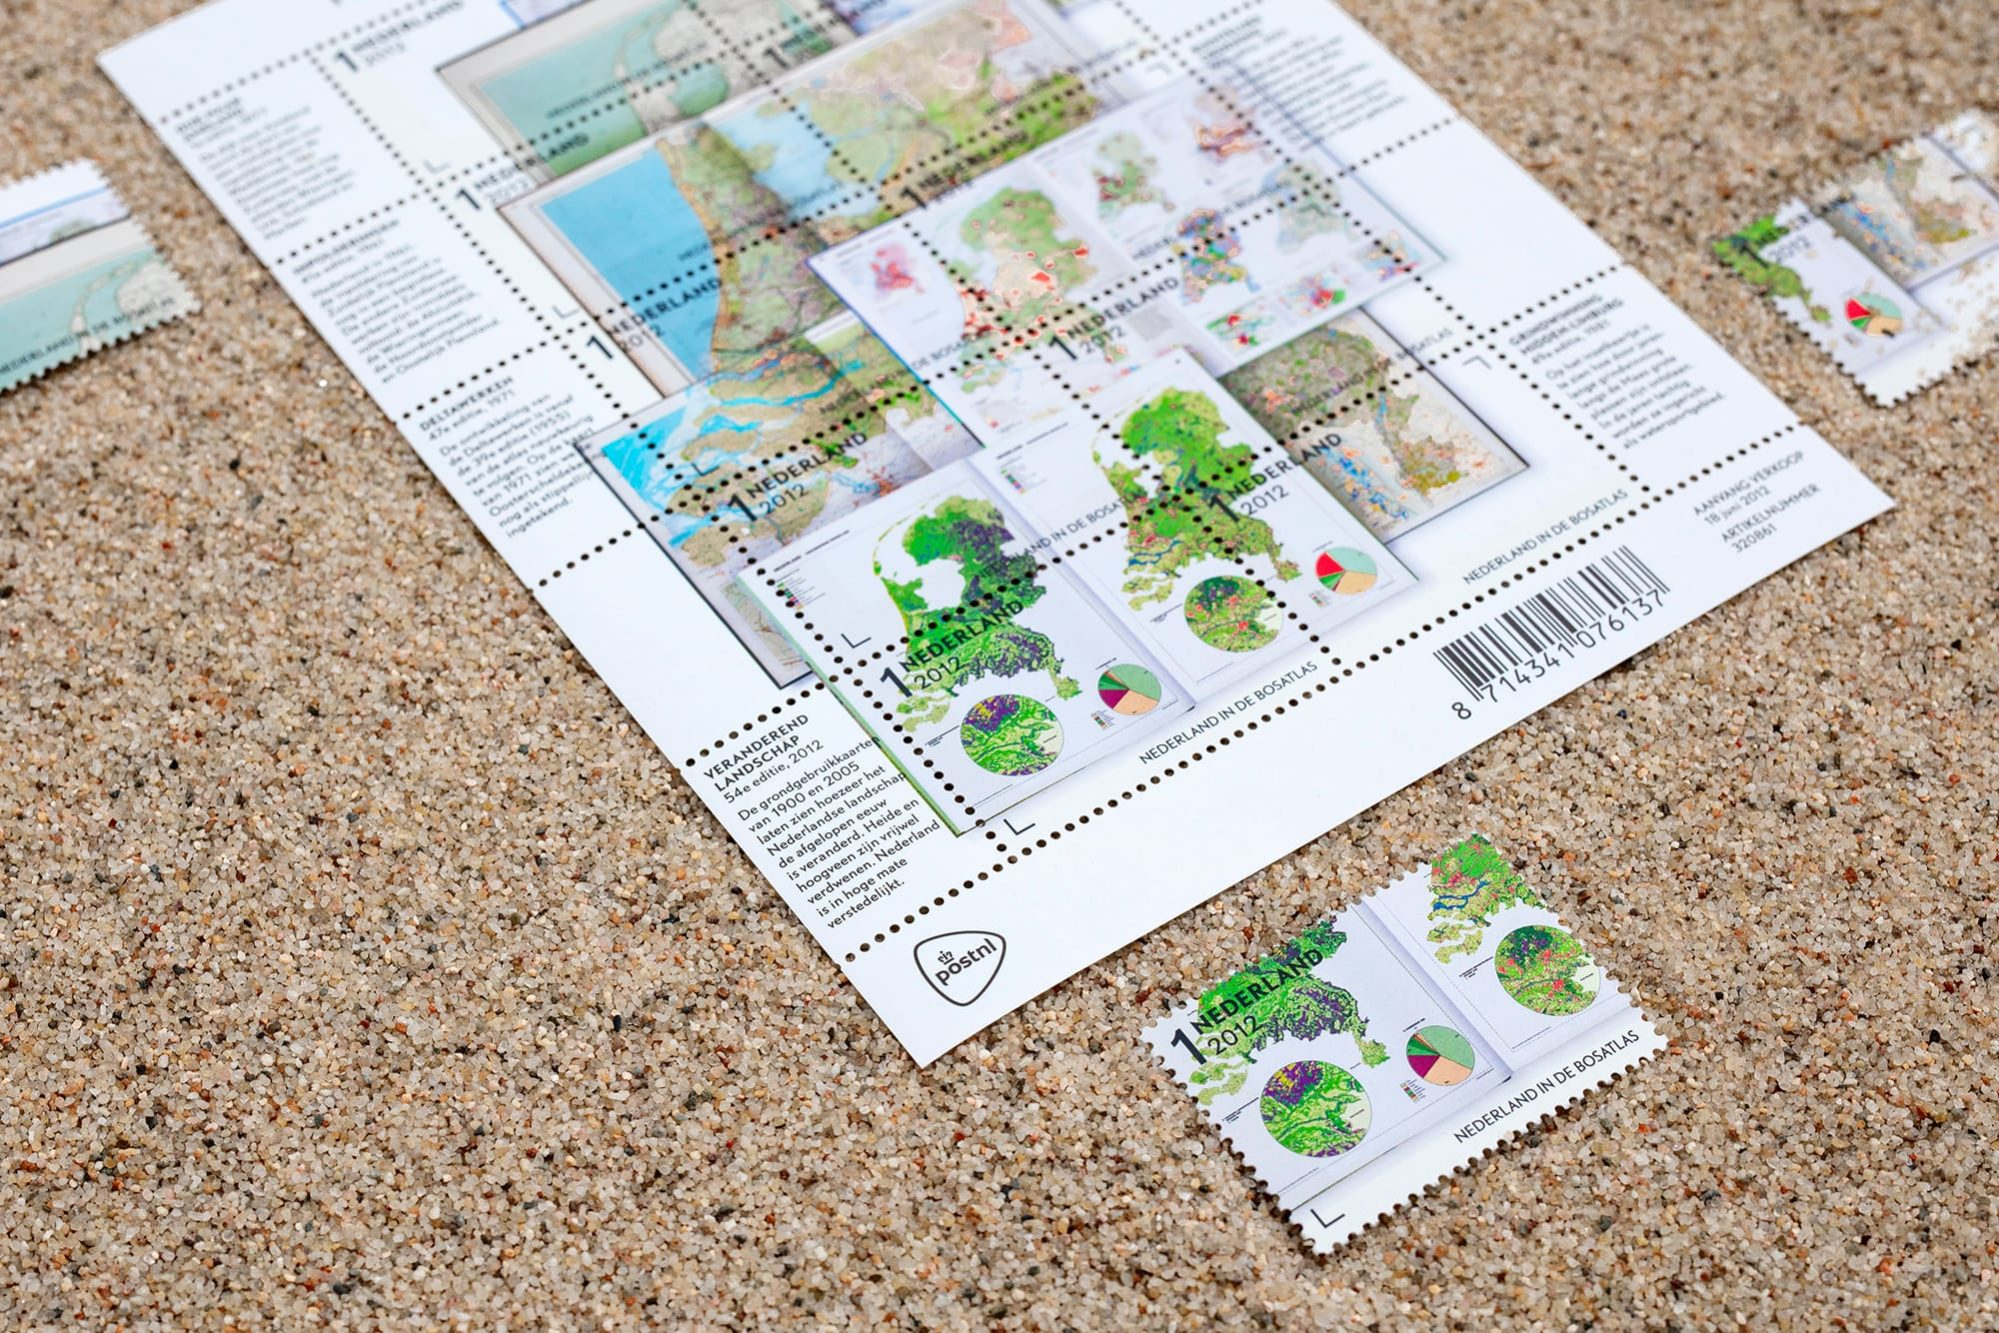 Haller Brun Nederland in de Bosatlas stamps Post NL Noordhoff Publishers